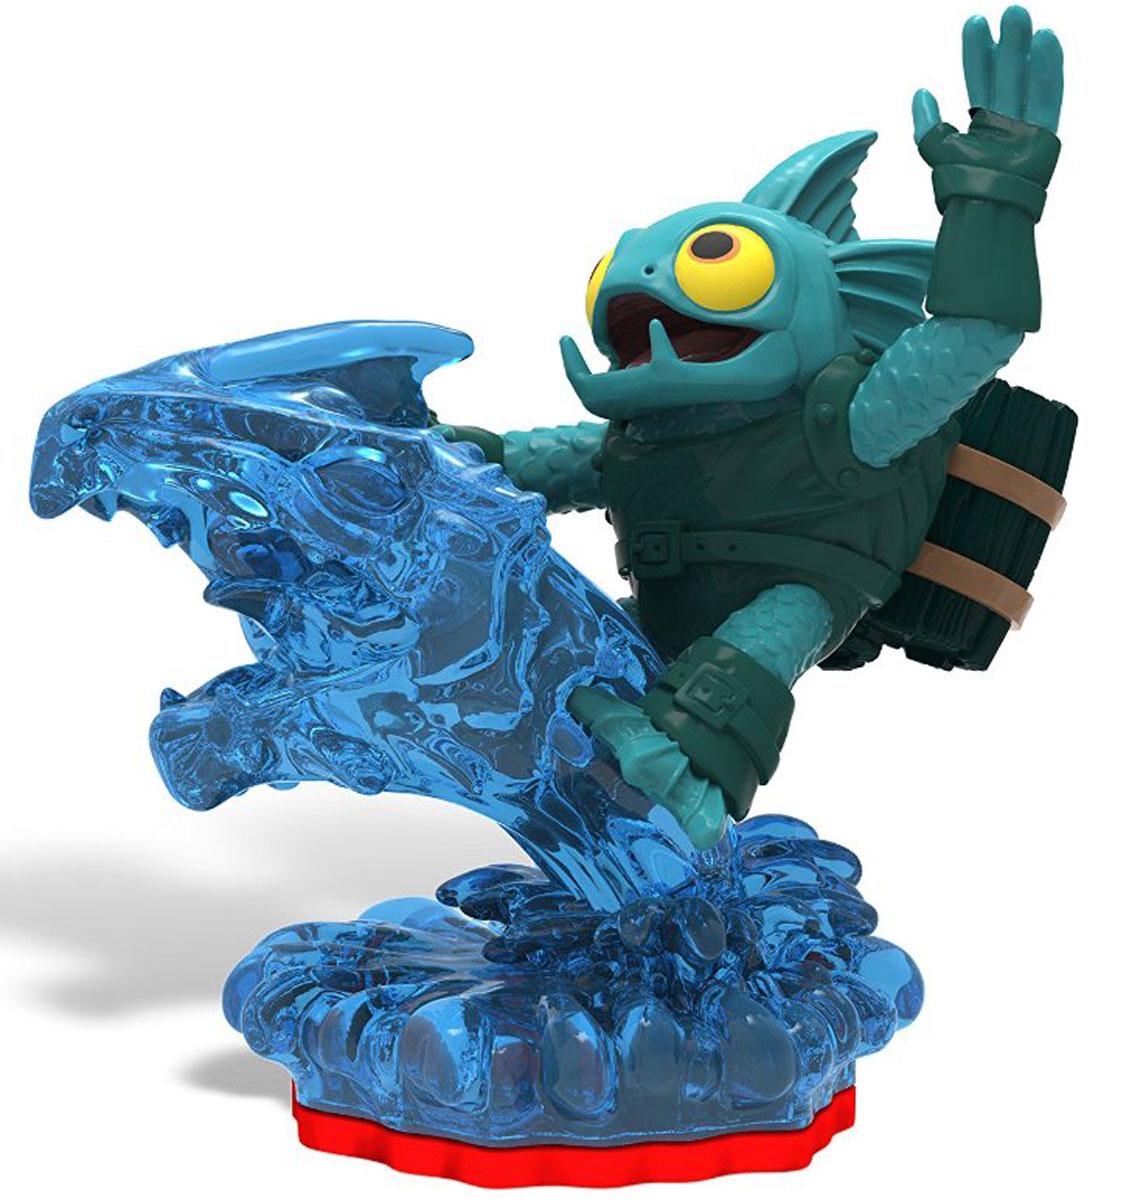 Skylanders Trap Team. Интерактивная фигурка Tidal Wave Gill Grunt, Toys For Bob